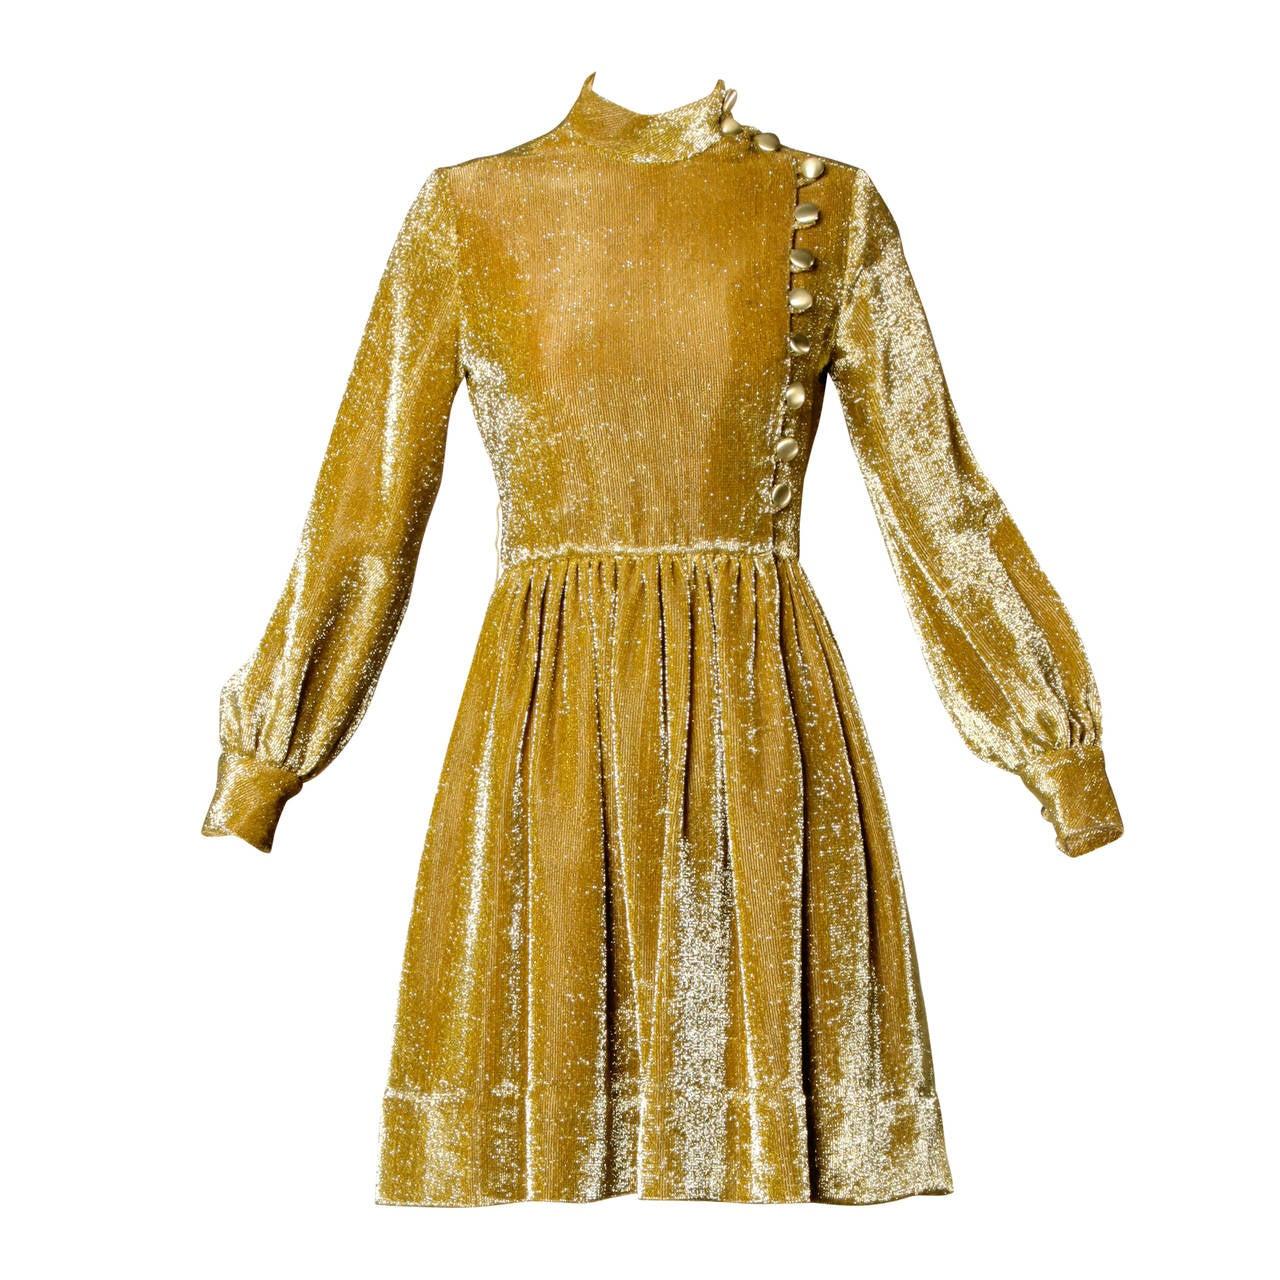 Mr. Mort Vintage 1960s Metallic Gold Lurex Coat Dress 1